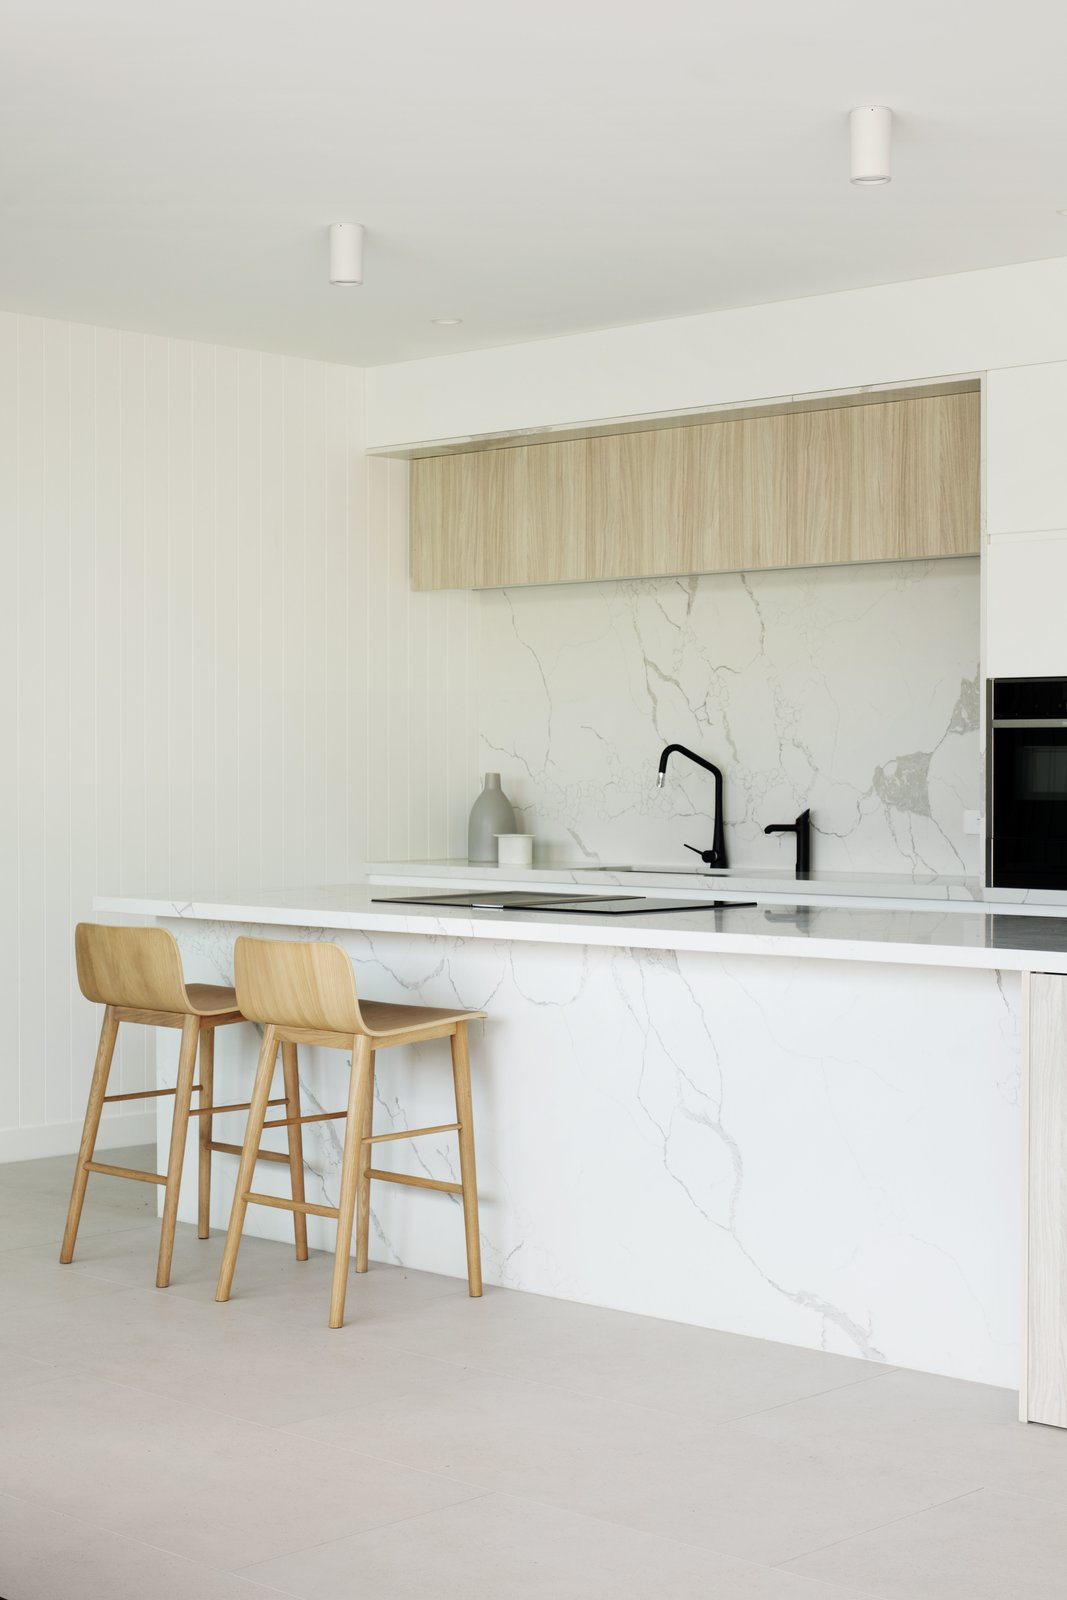 Kitchen, Ceiling Lighting, Stone Counter, Ceramic Tile Floor, Stone Slab Backsplashe, Cooktops, White Cabinet, and Wall Oven  Warraweena